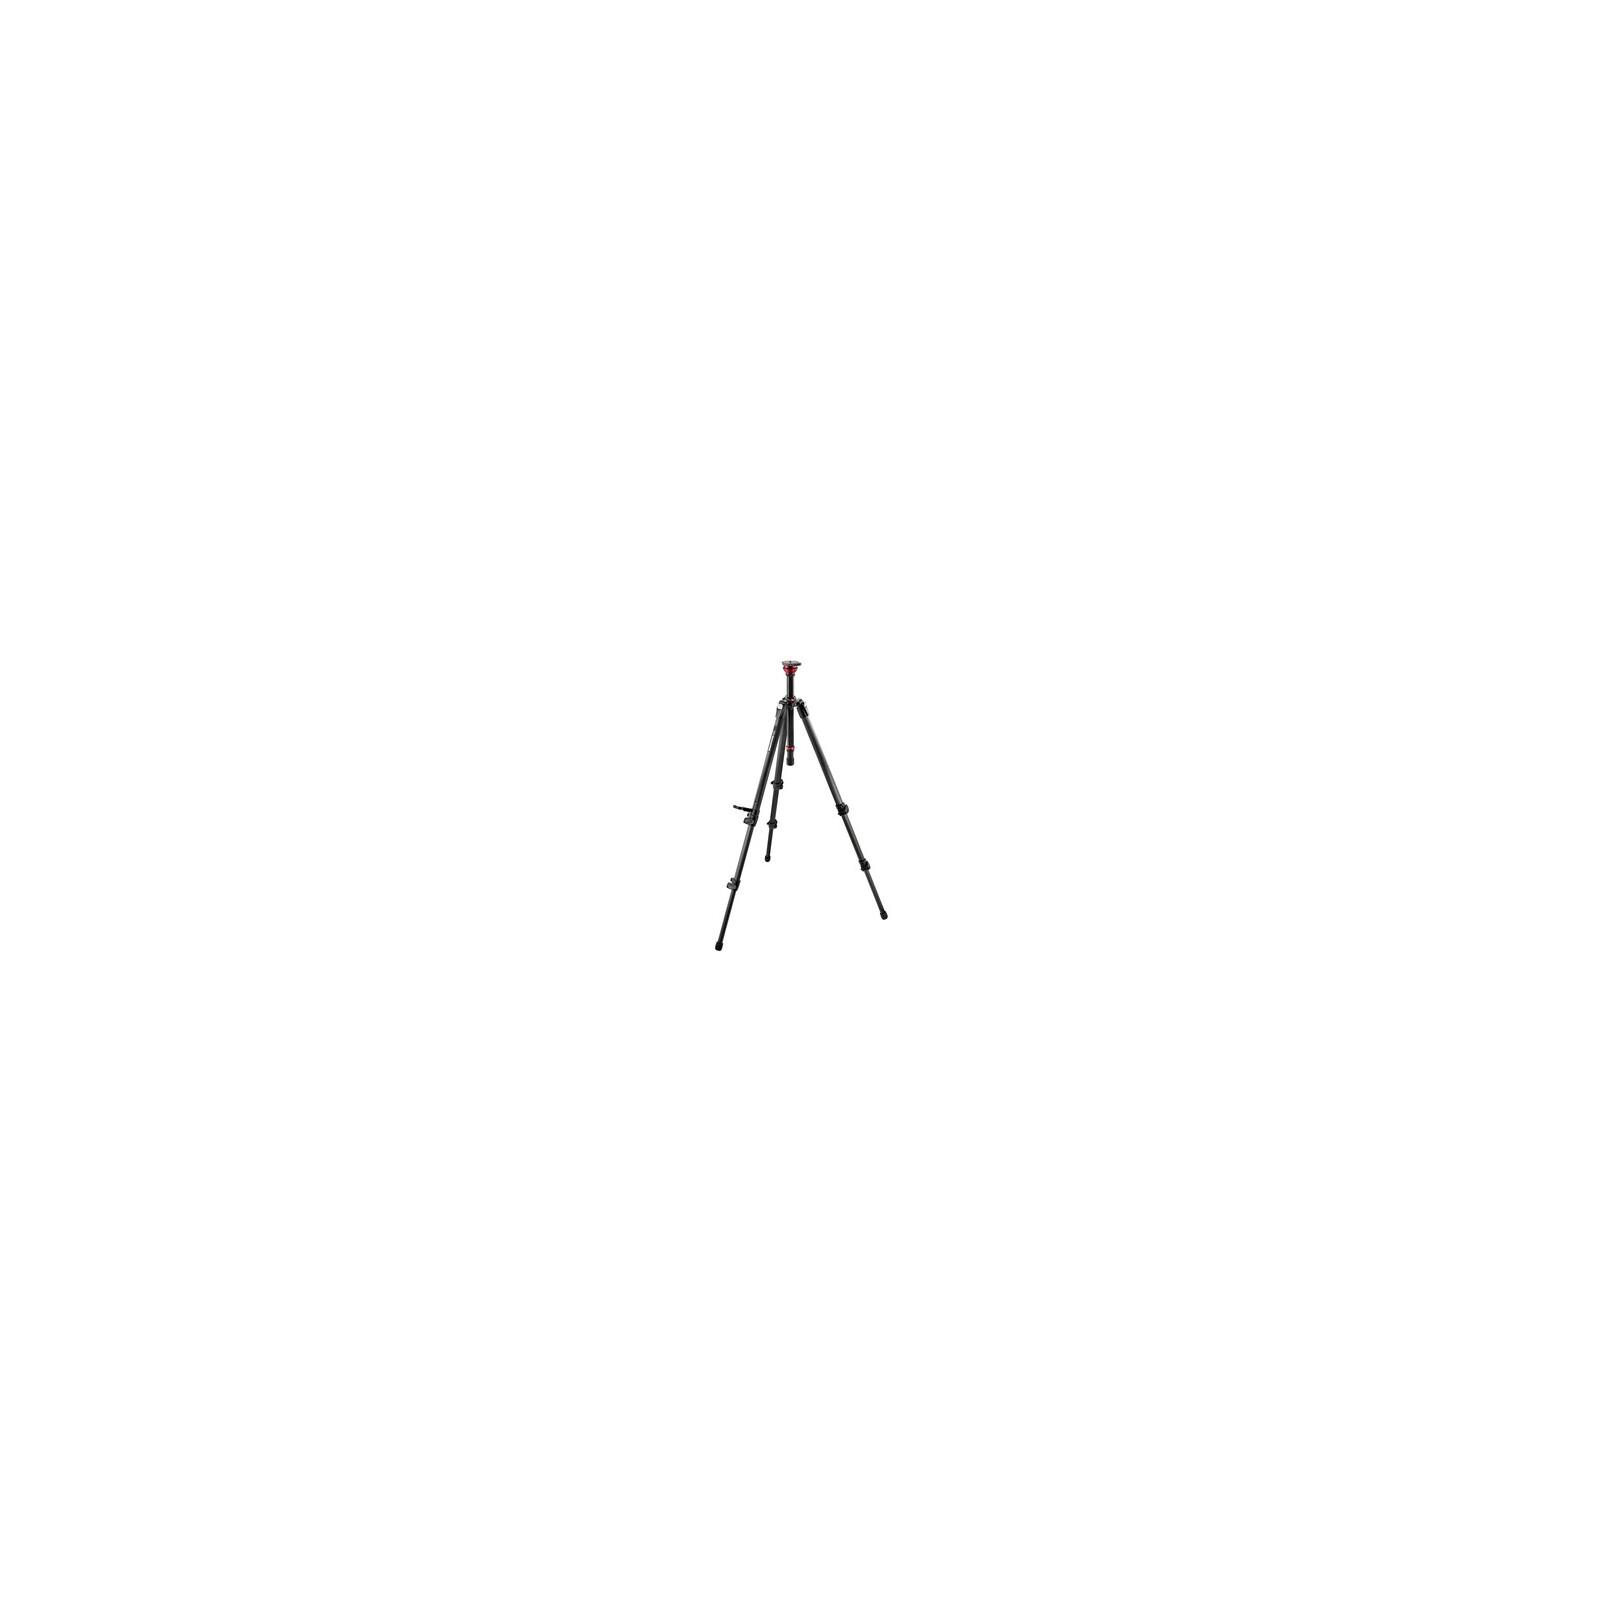 Manfrotto 755CX3 MDEVE-Video-Stativ